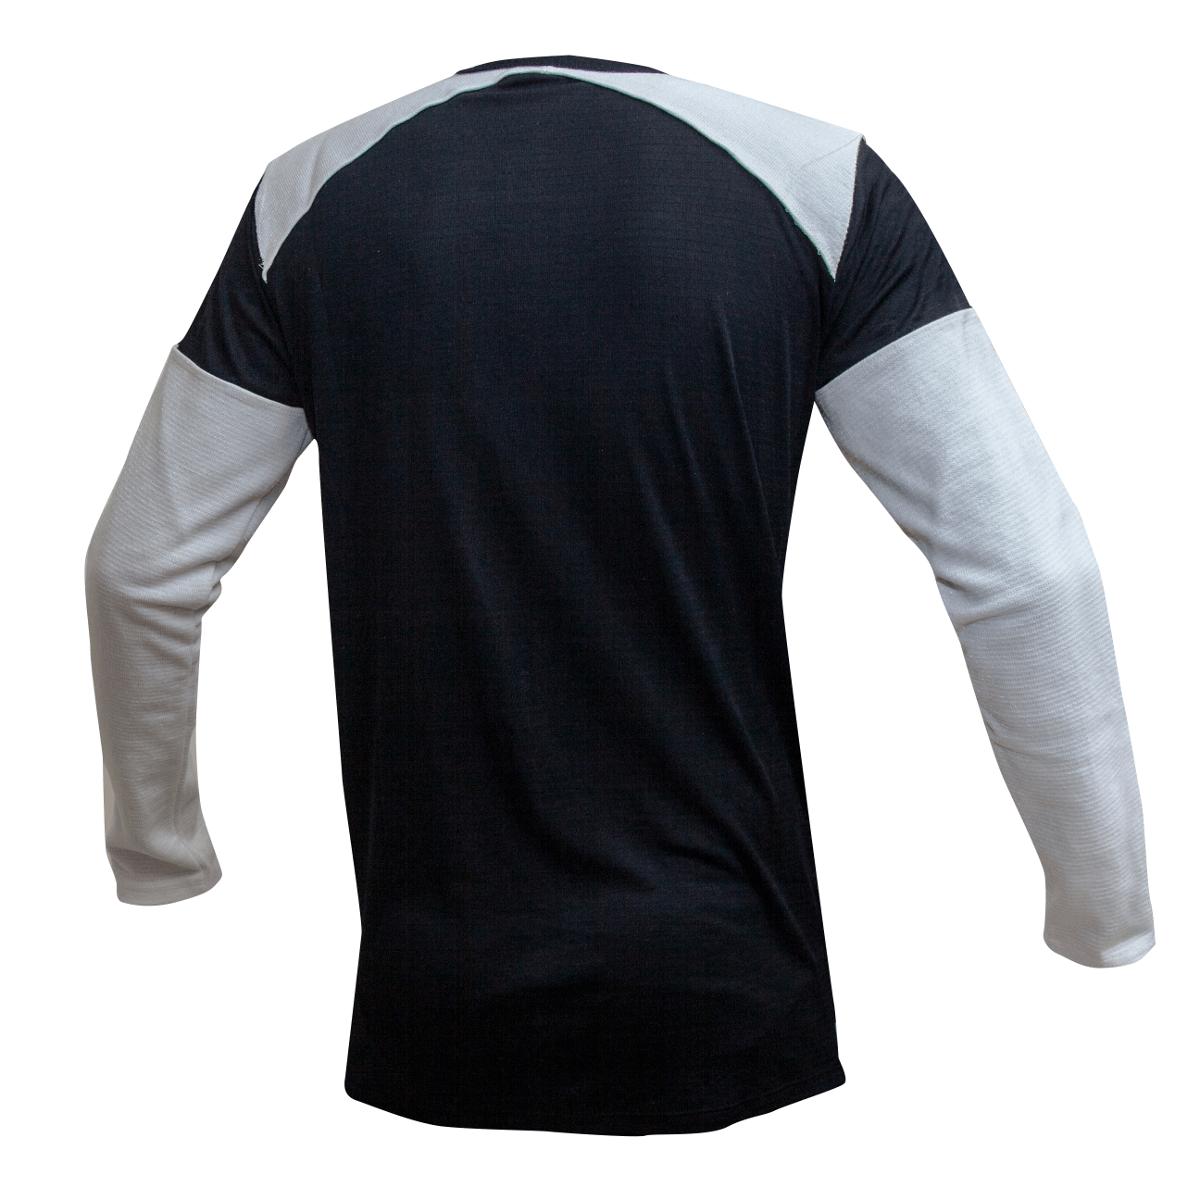 010L Camiseta Nocut Dynetex - Prendas EPI